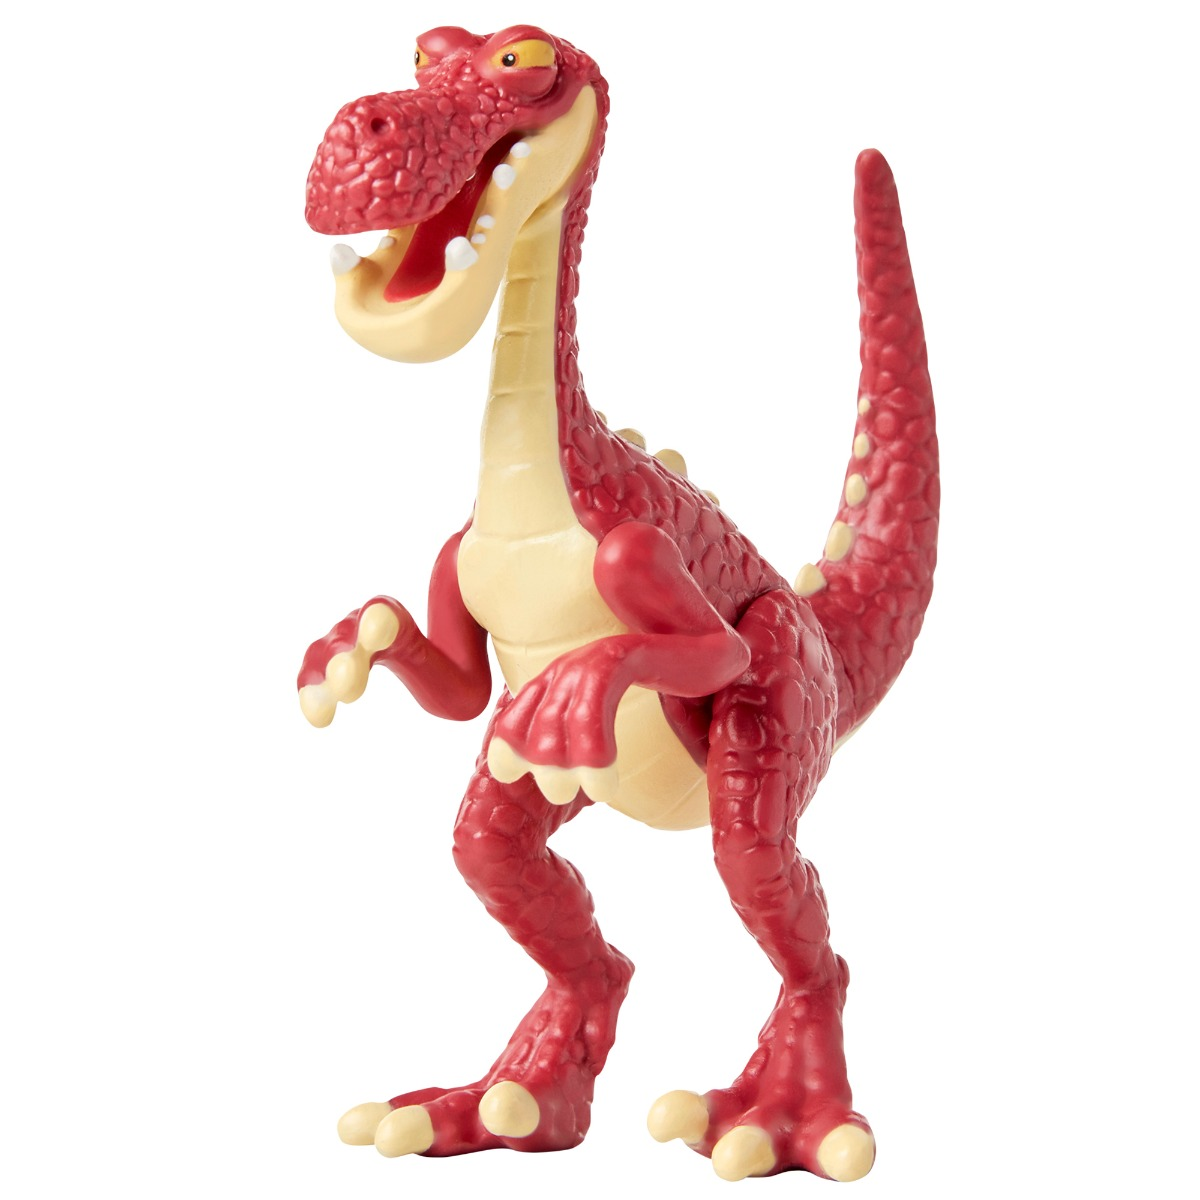 Figurina articulata dinozaur Gigantosaurus, Totor